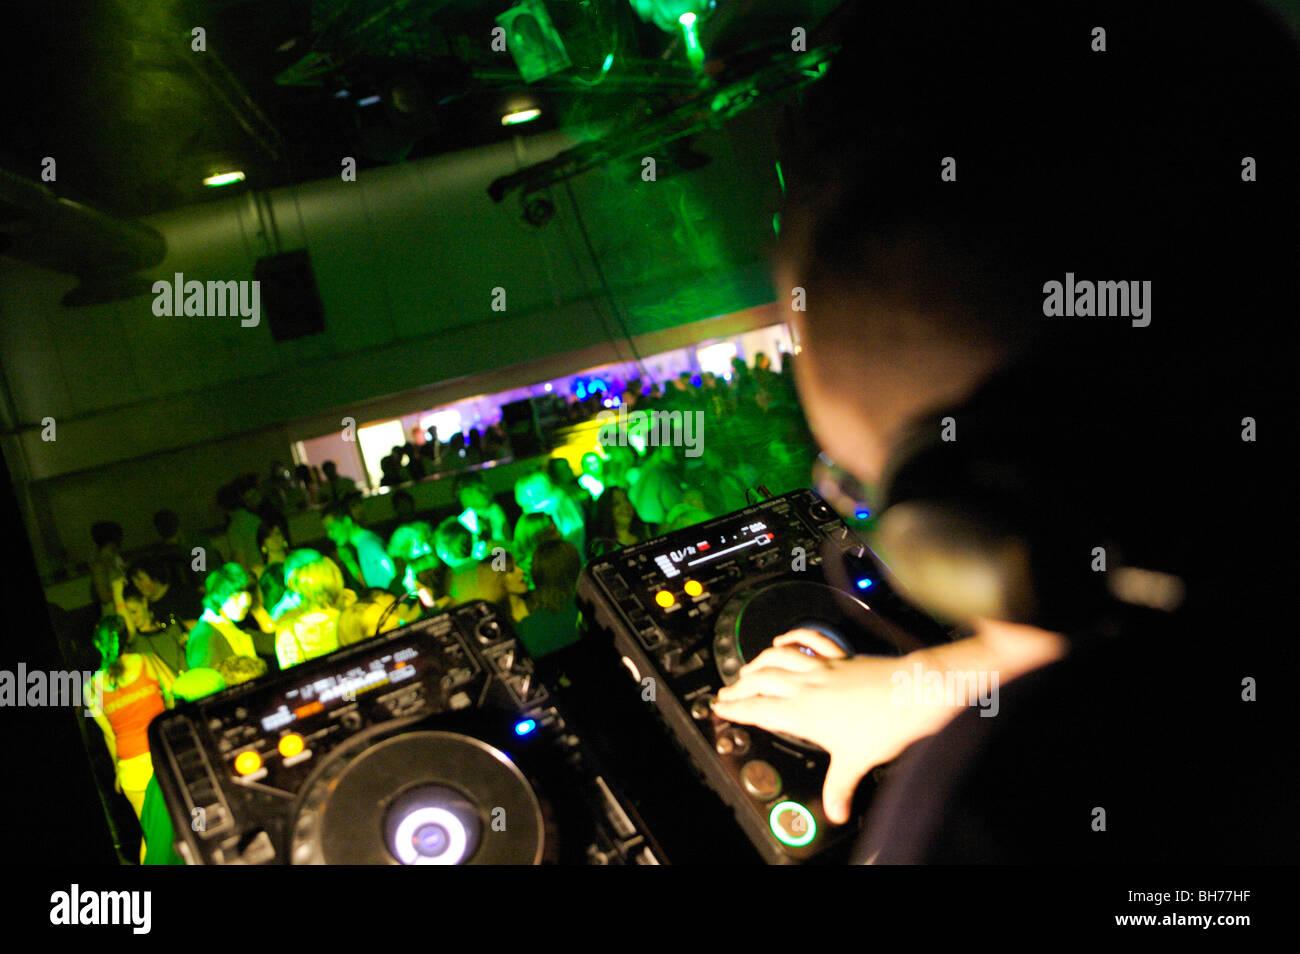 lighting desk, club, dj, CD, MUSIC, bright, colour, party